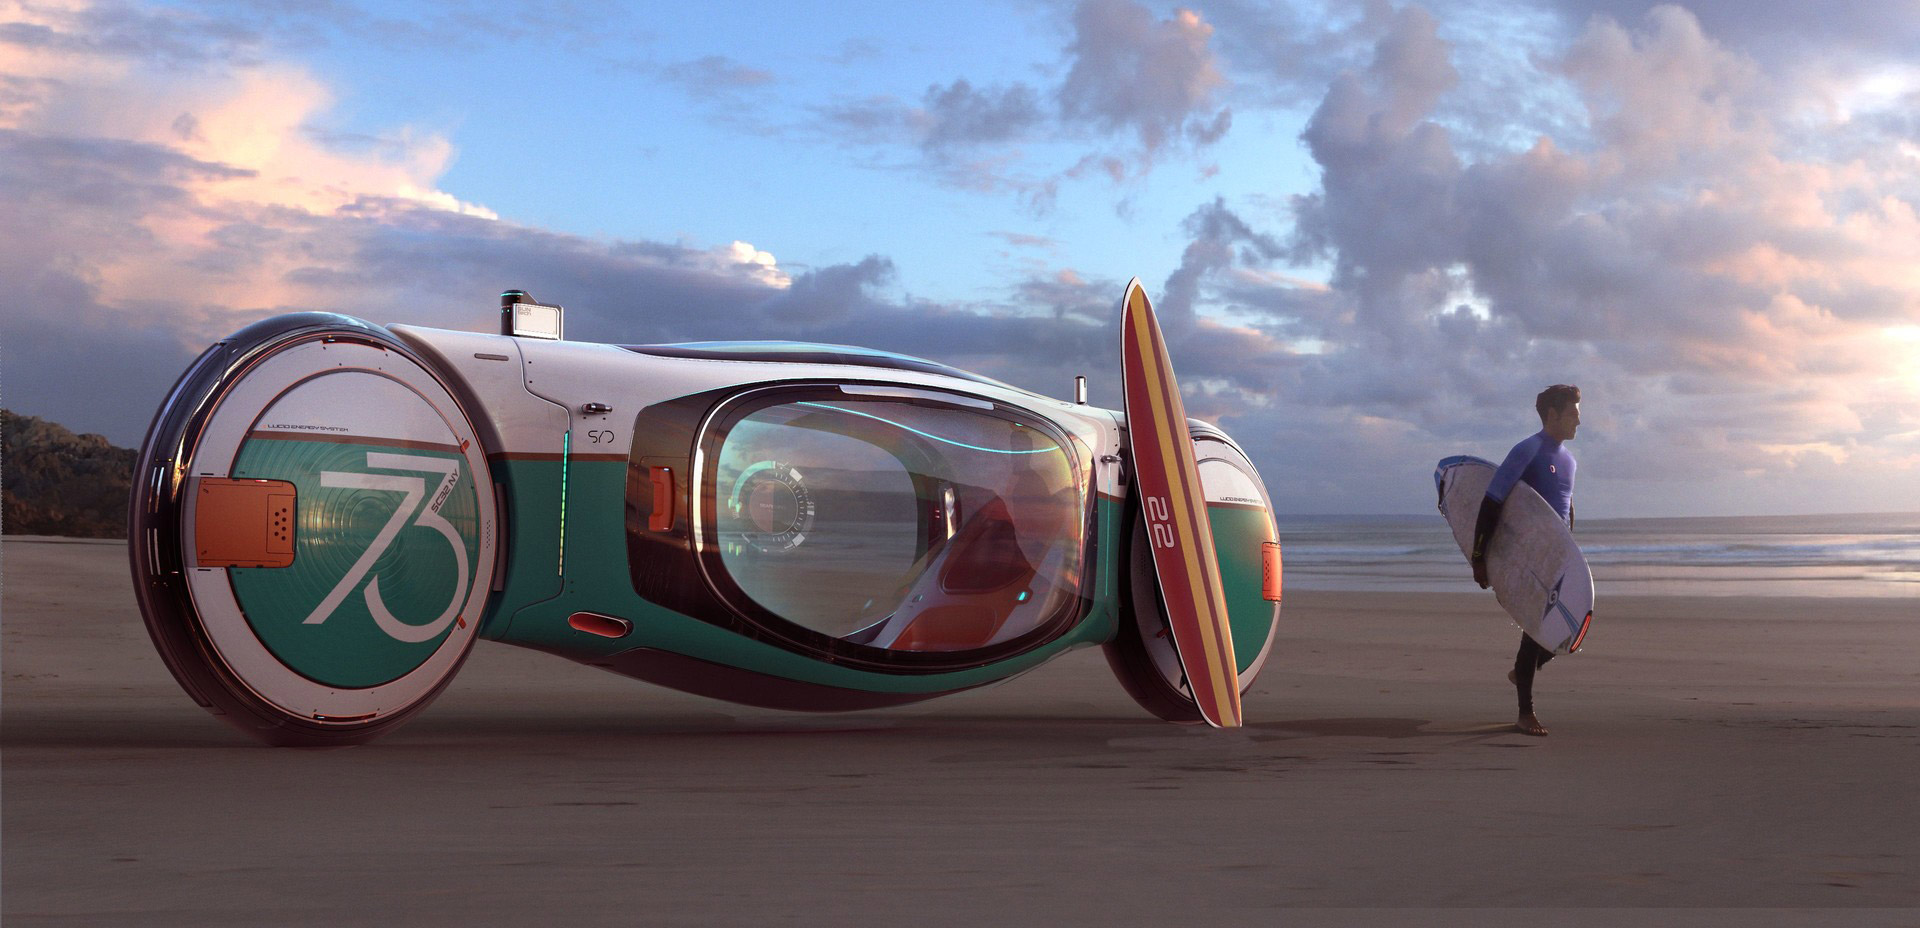 The Futuristic Sci-Fi Art of Andrian Luchian